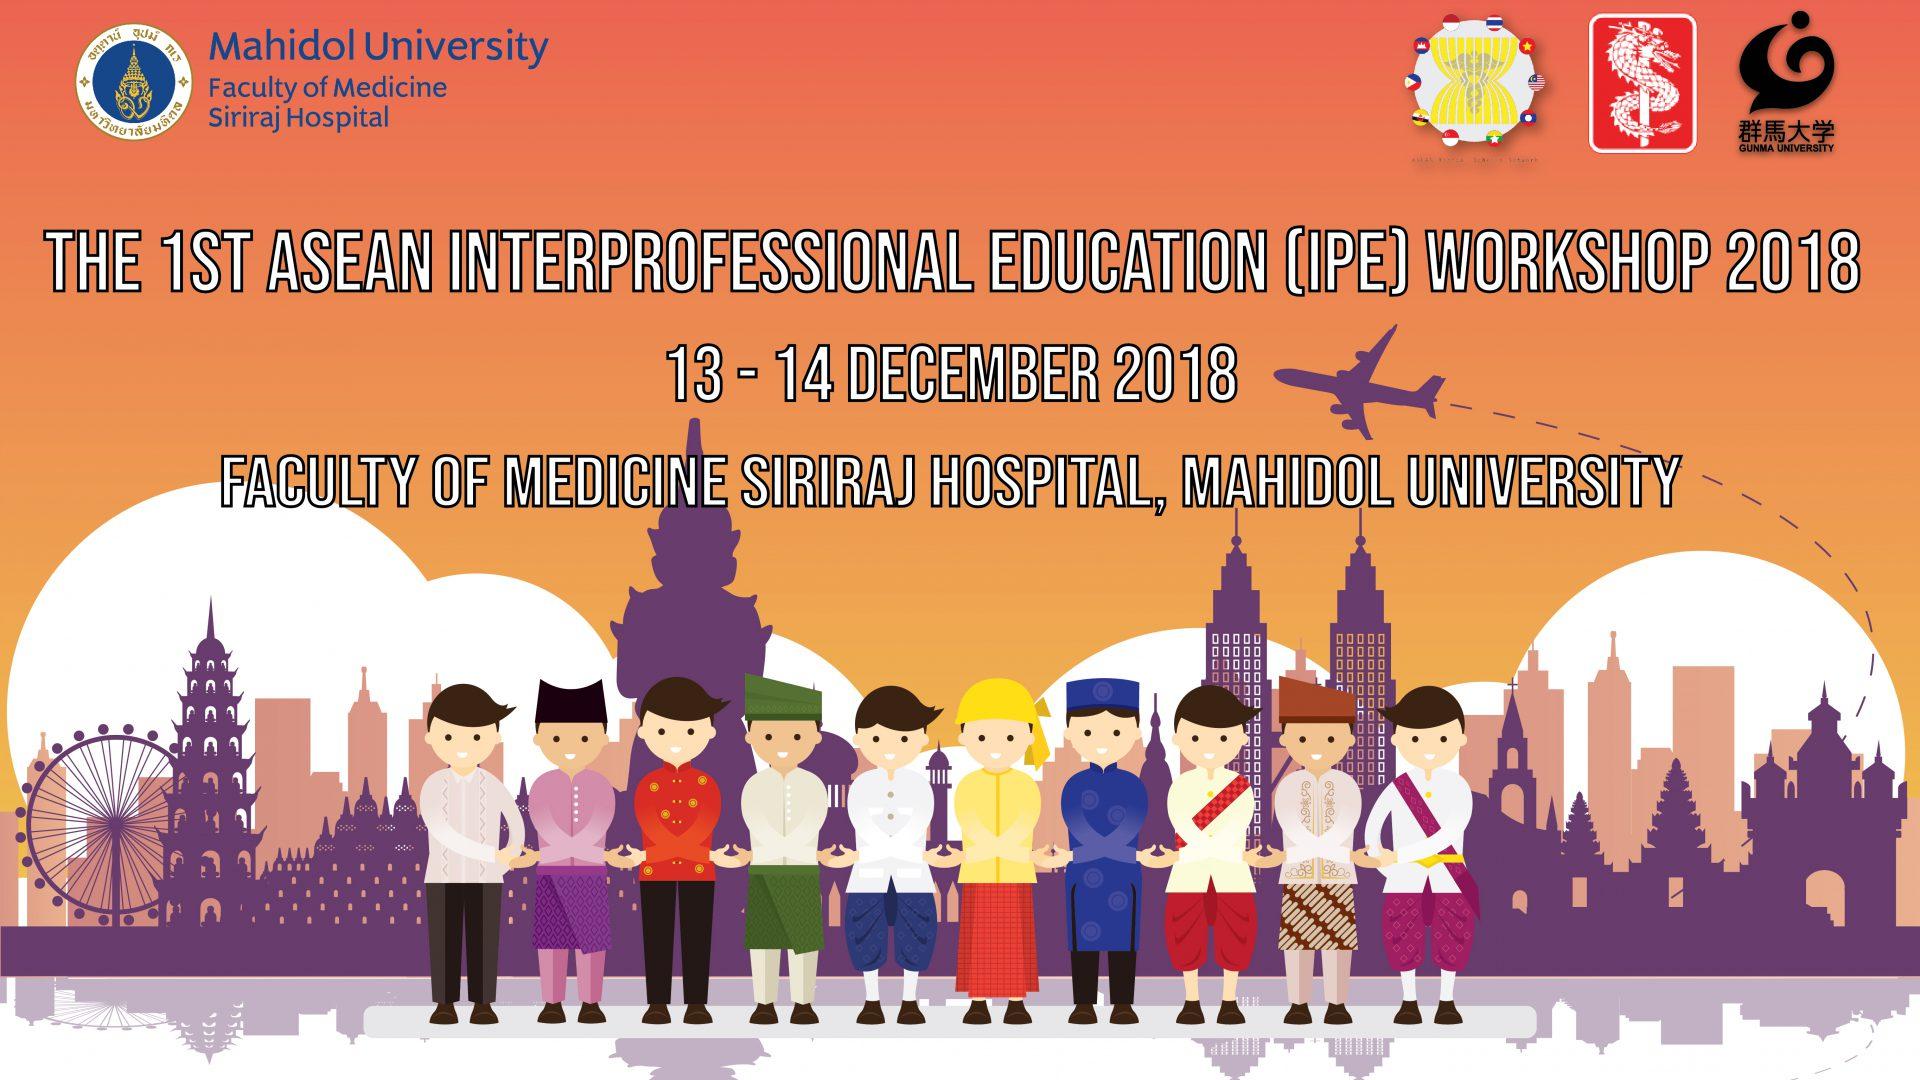 The 1st ASEAN Interprofessional Education Workshop 2018